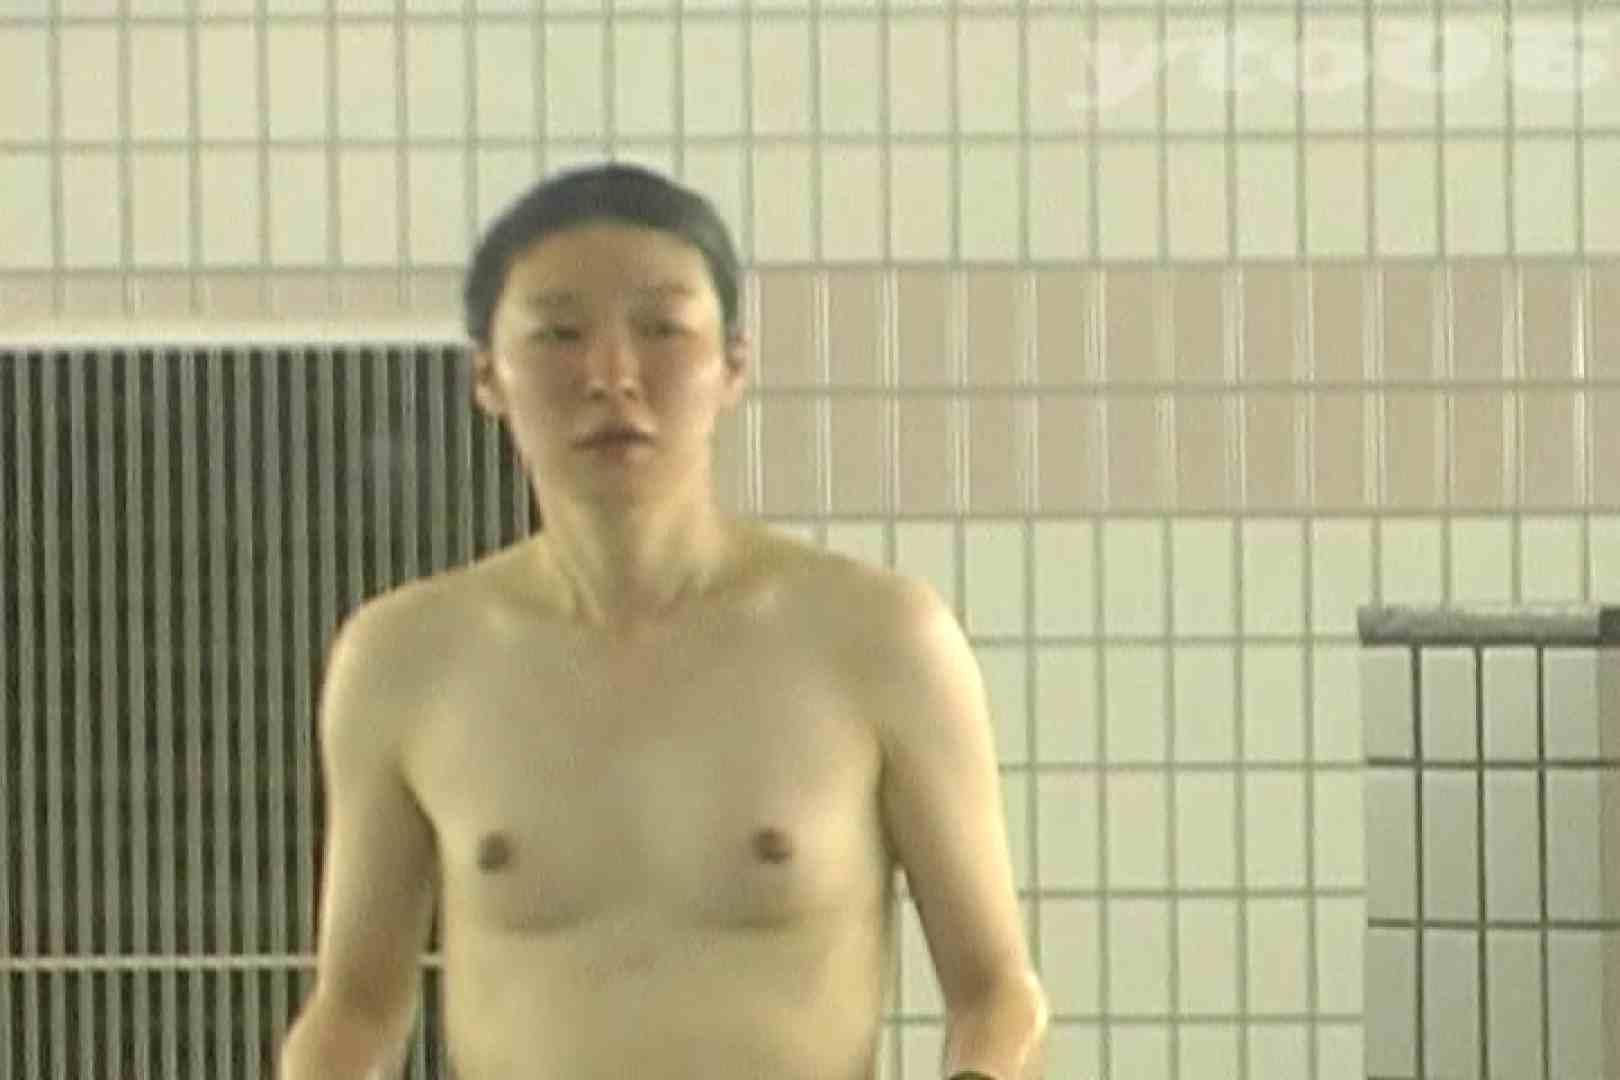 ▲復活限定▲合宿ホテル女風呂盗撮 Vol.36 期間限定 エロ画像 98連発 95